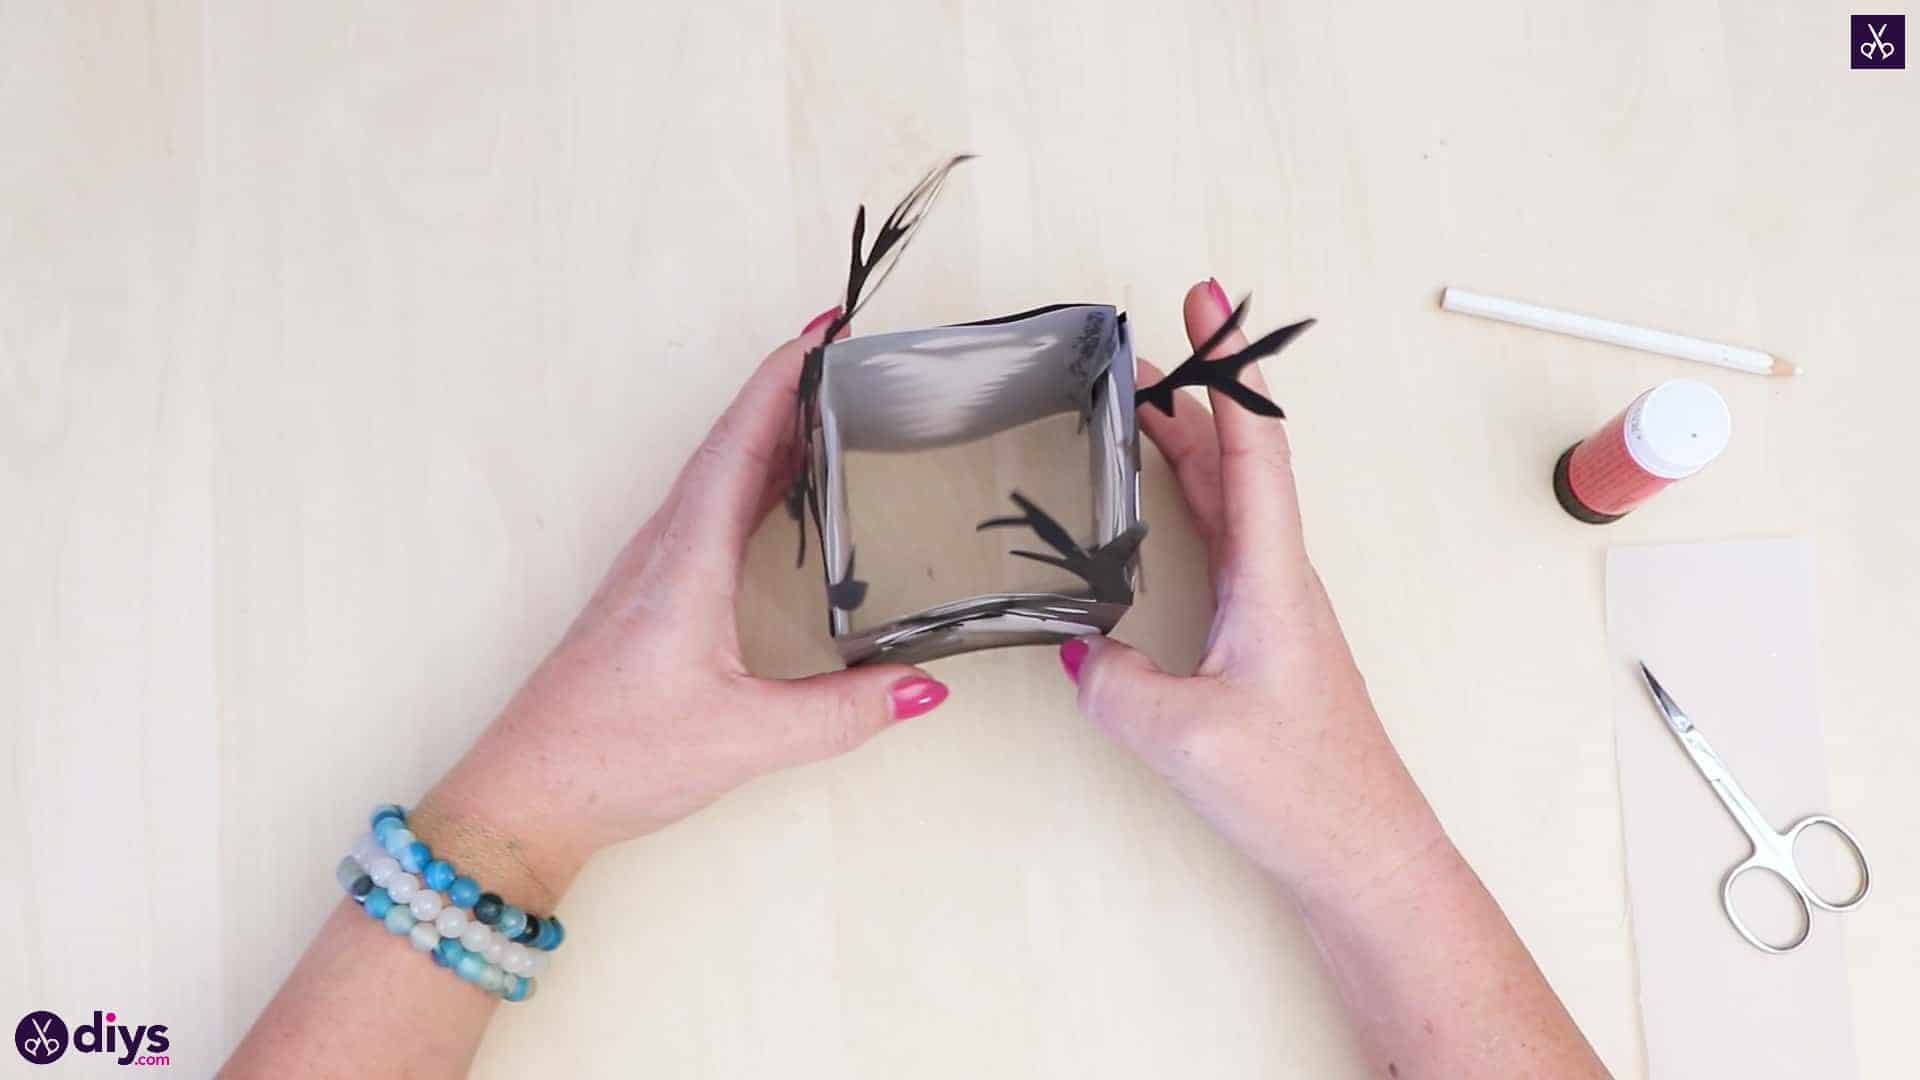 Diy paper lantern art step 6bc